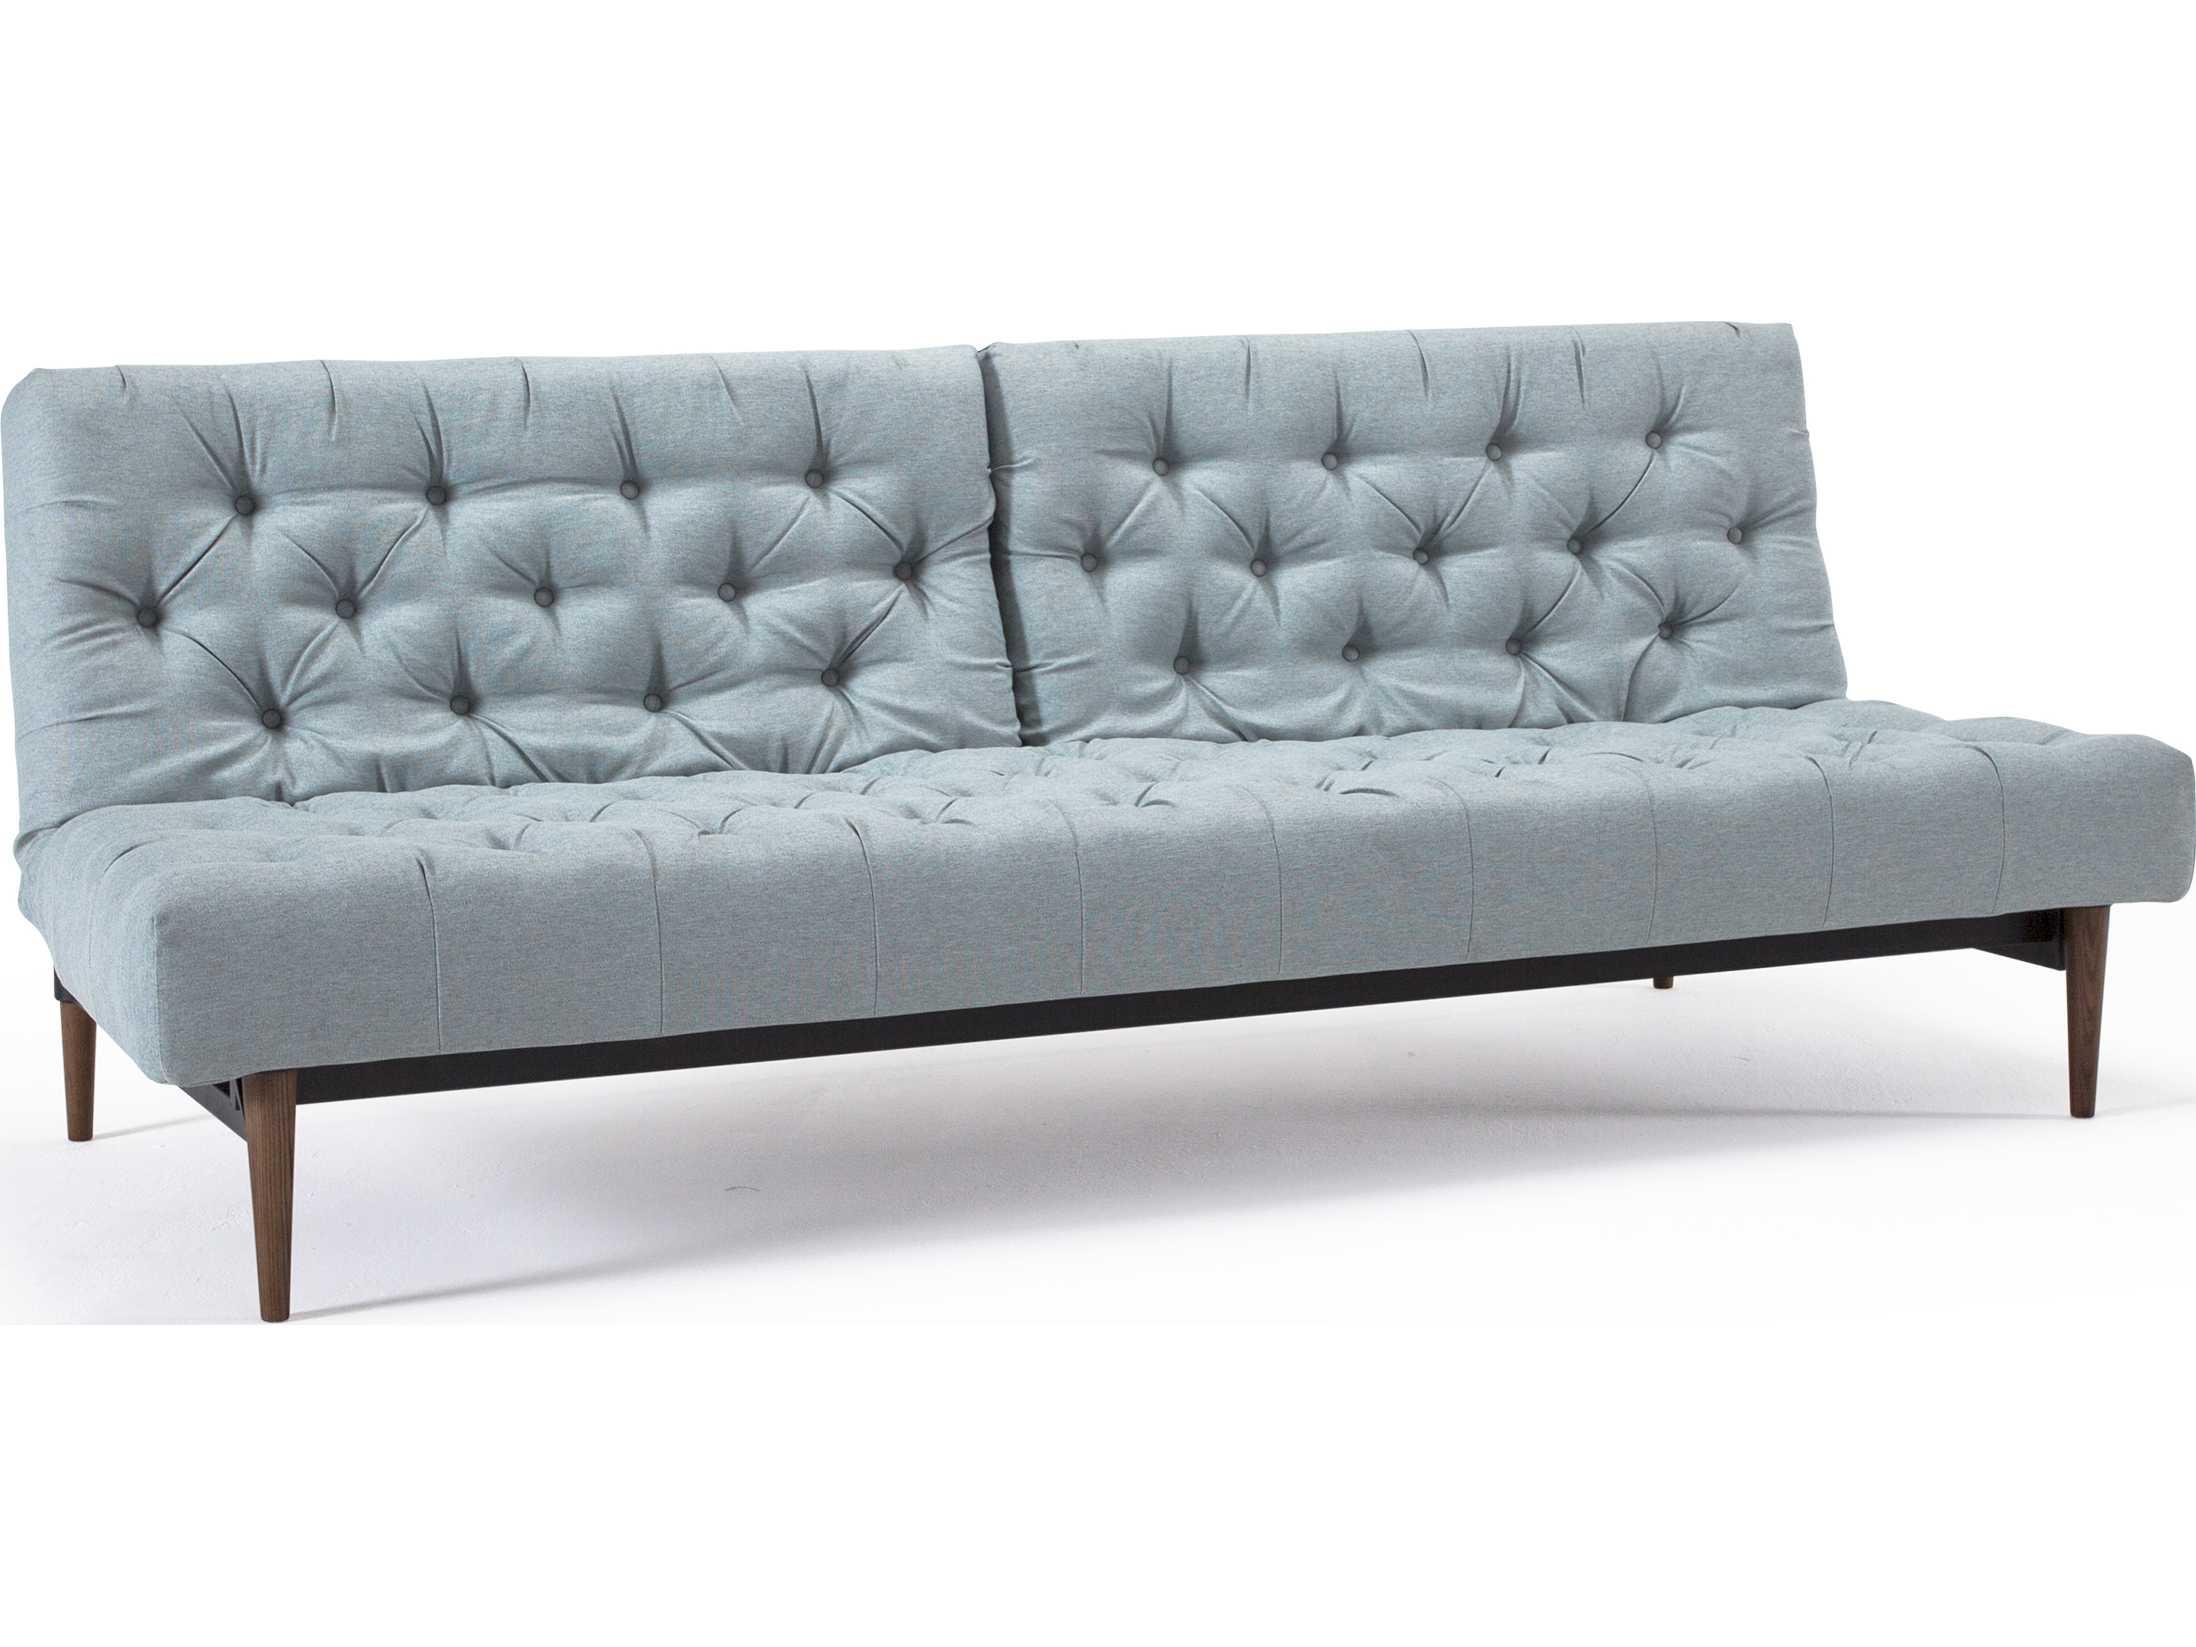 Remarkable Innovation Dublexo Oldschool Retro Dark Wood Legs Sofa Bed Ibusinesslaw Wood Chair Design Ideas Ibusinesslaworg